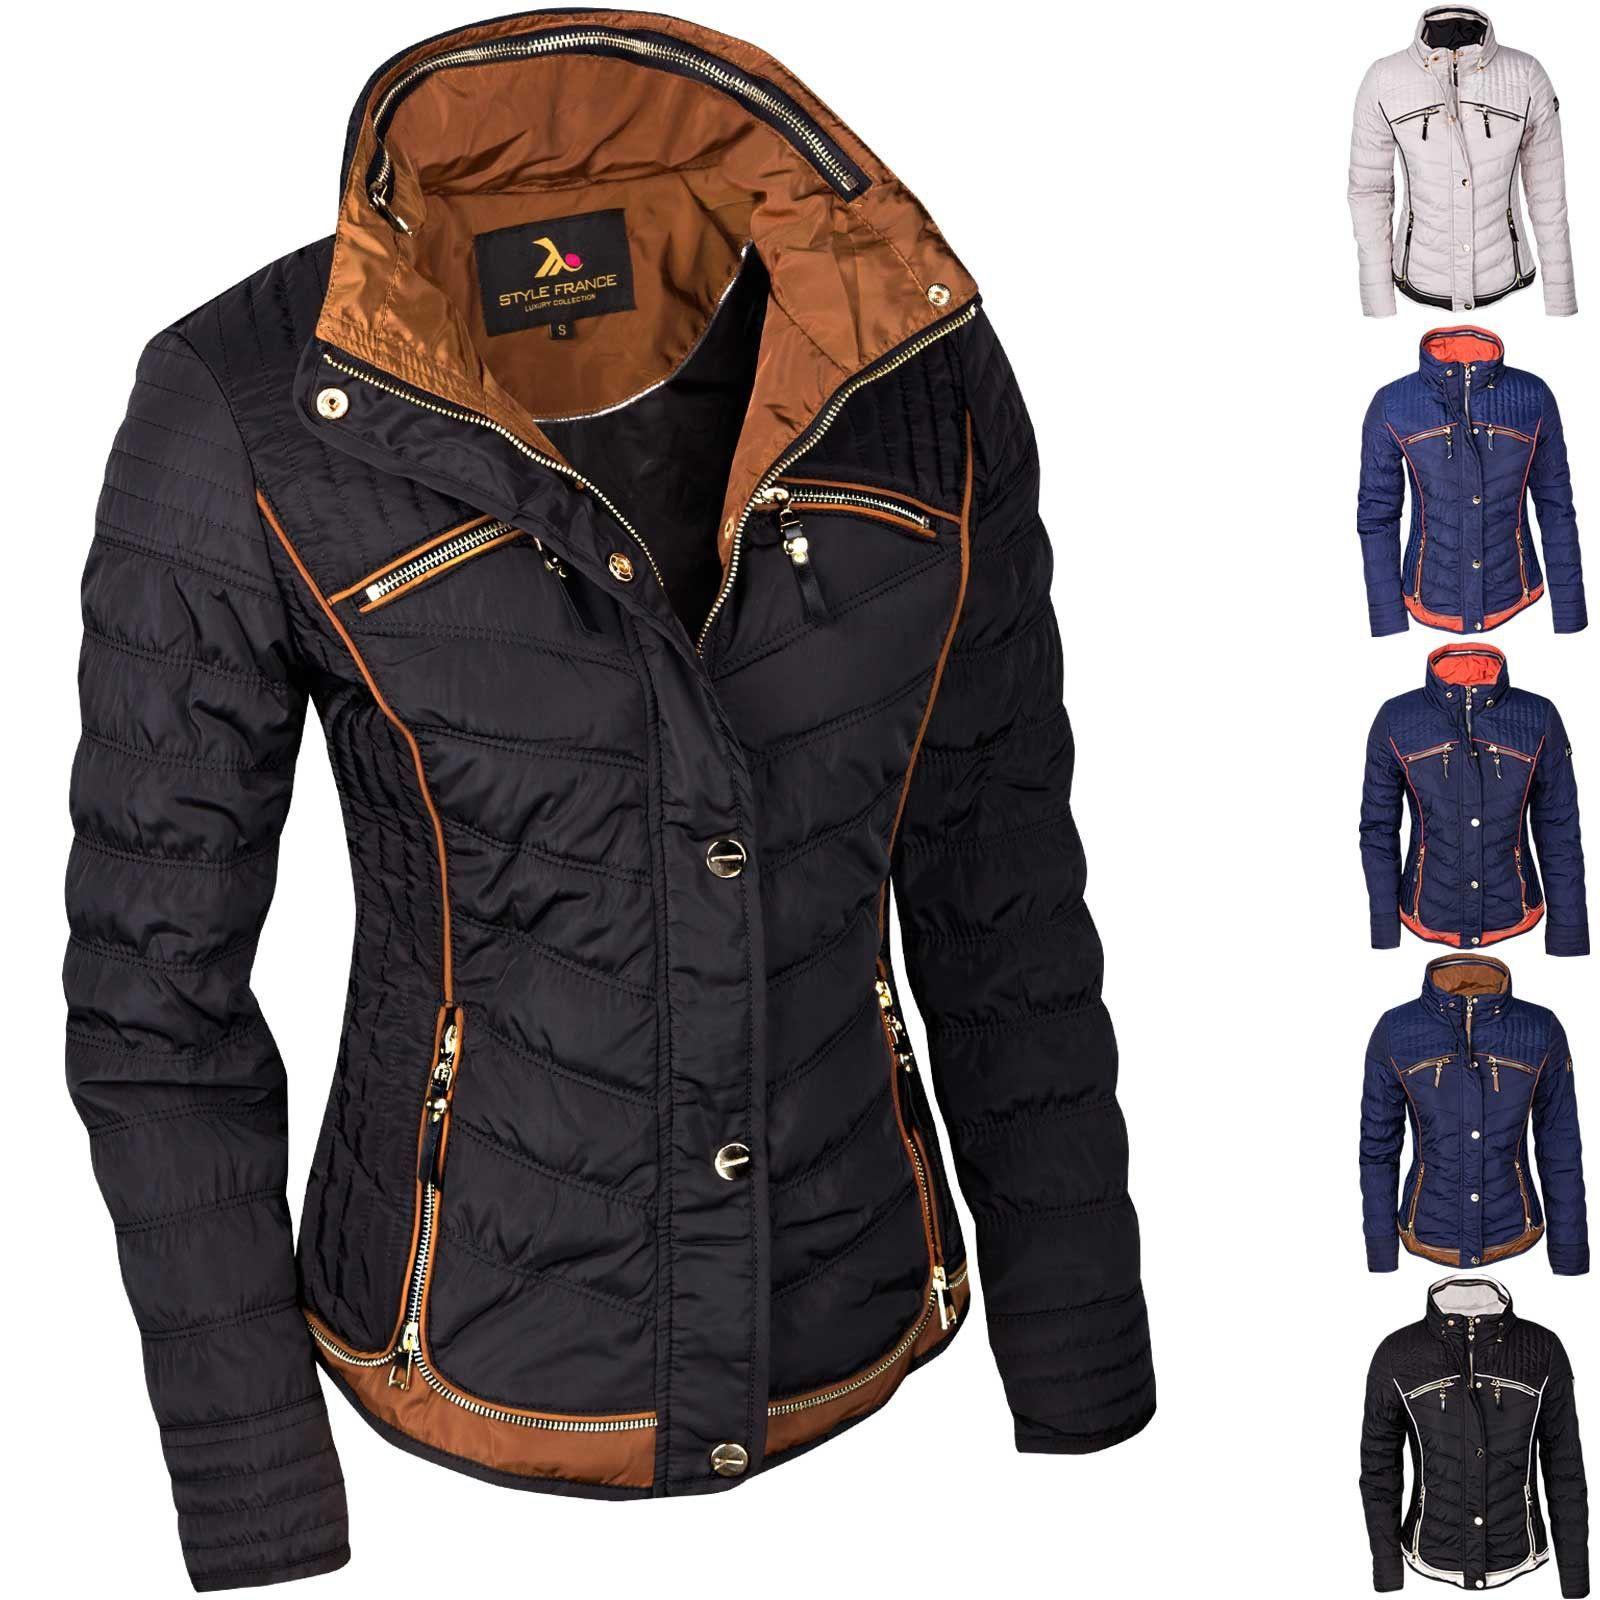 70bf3c93f0147b Damen Steppjacke Übergangsjacke Mit Kapuze Damen Mode Jacken | Horses |  Jacken, Reitkleidung, Steppjacke